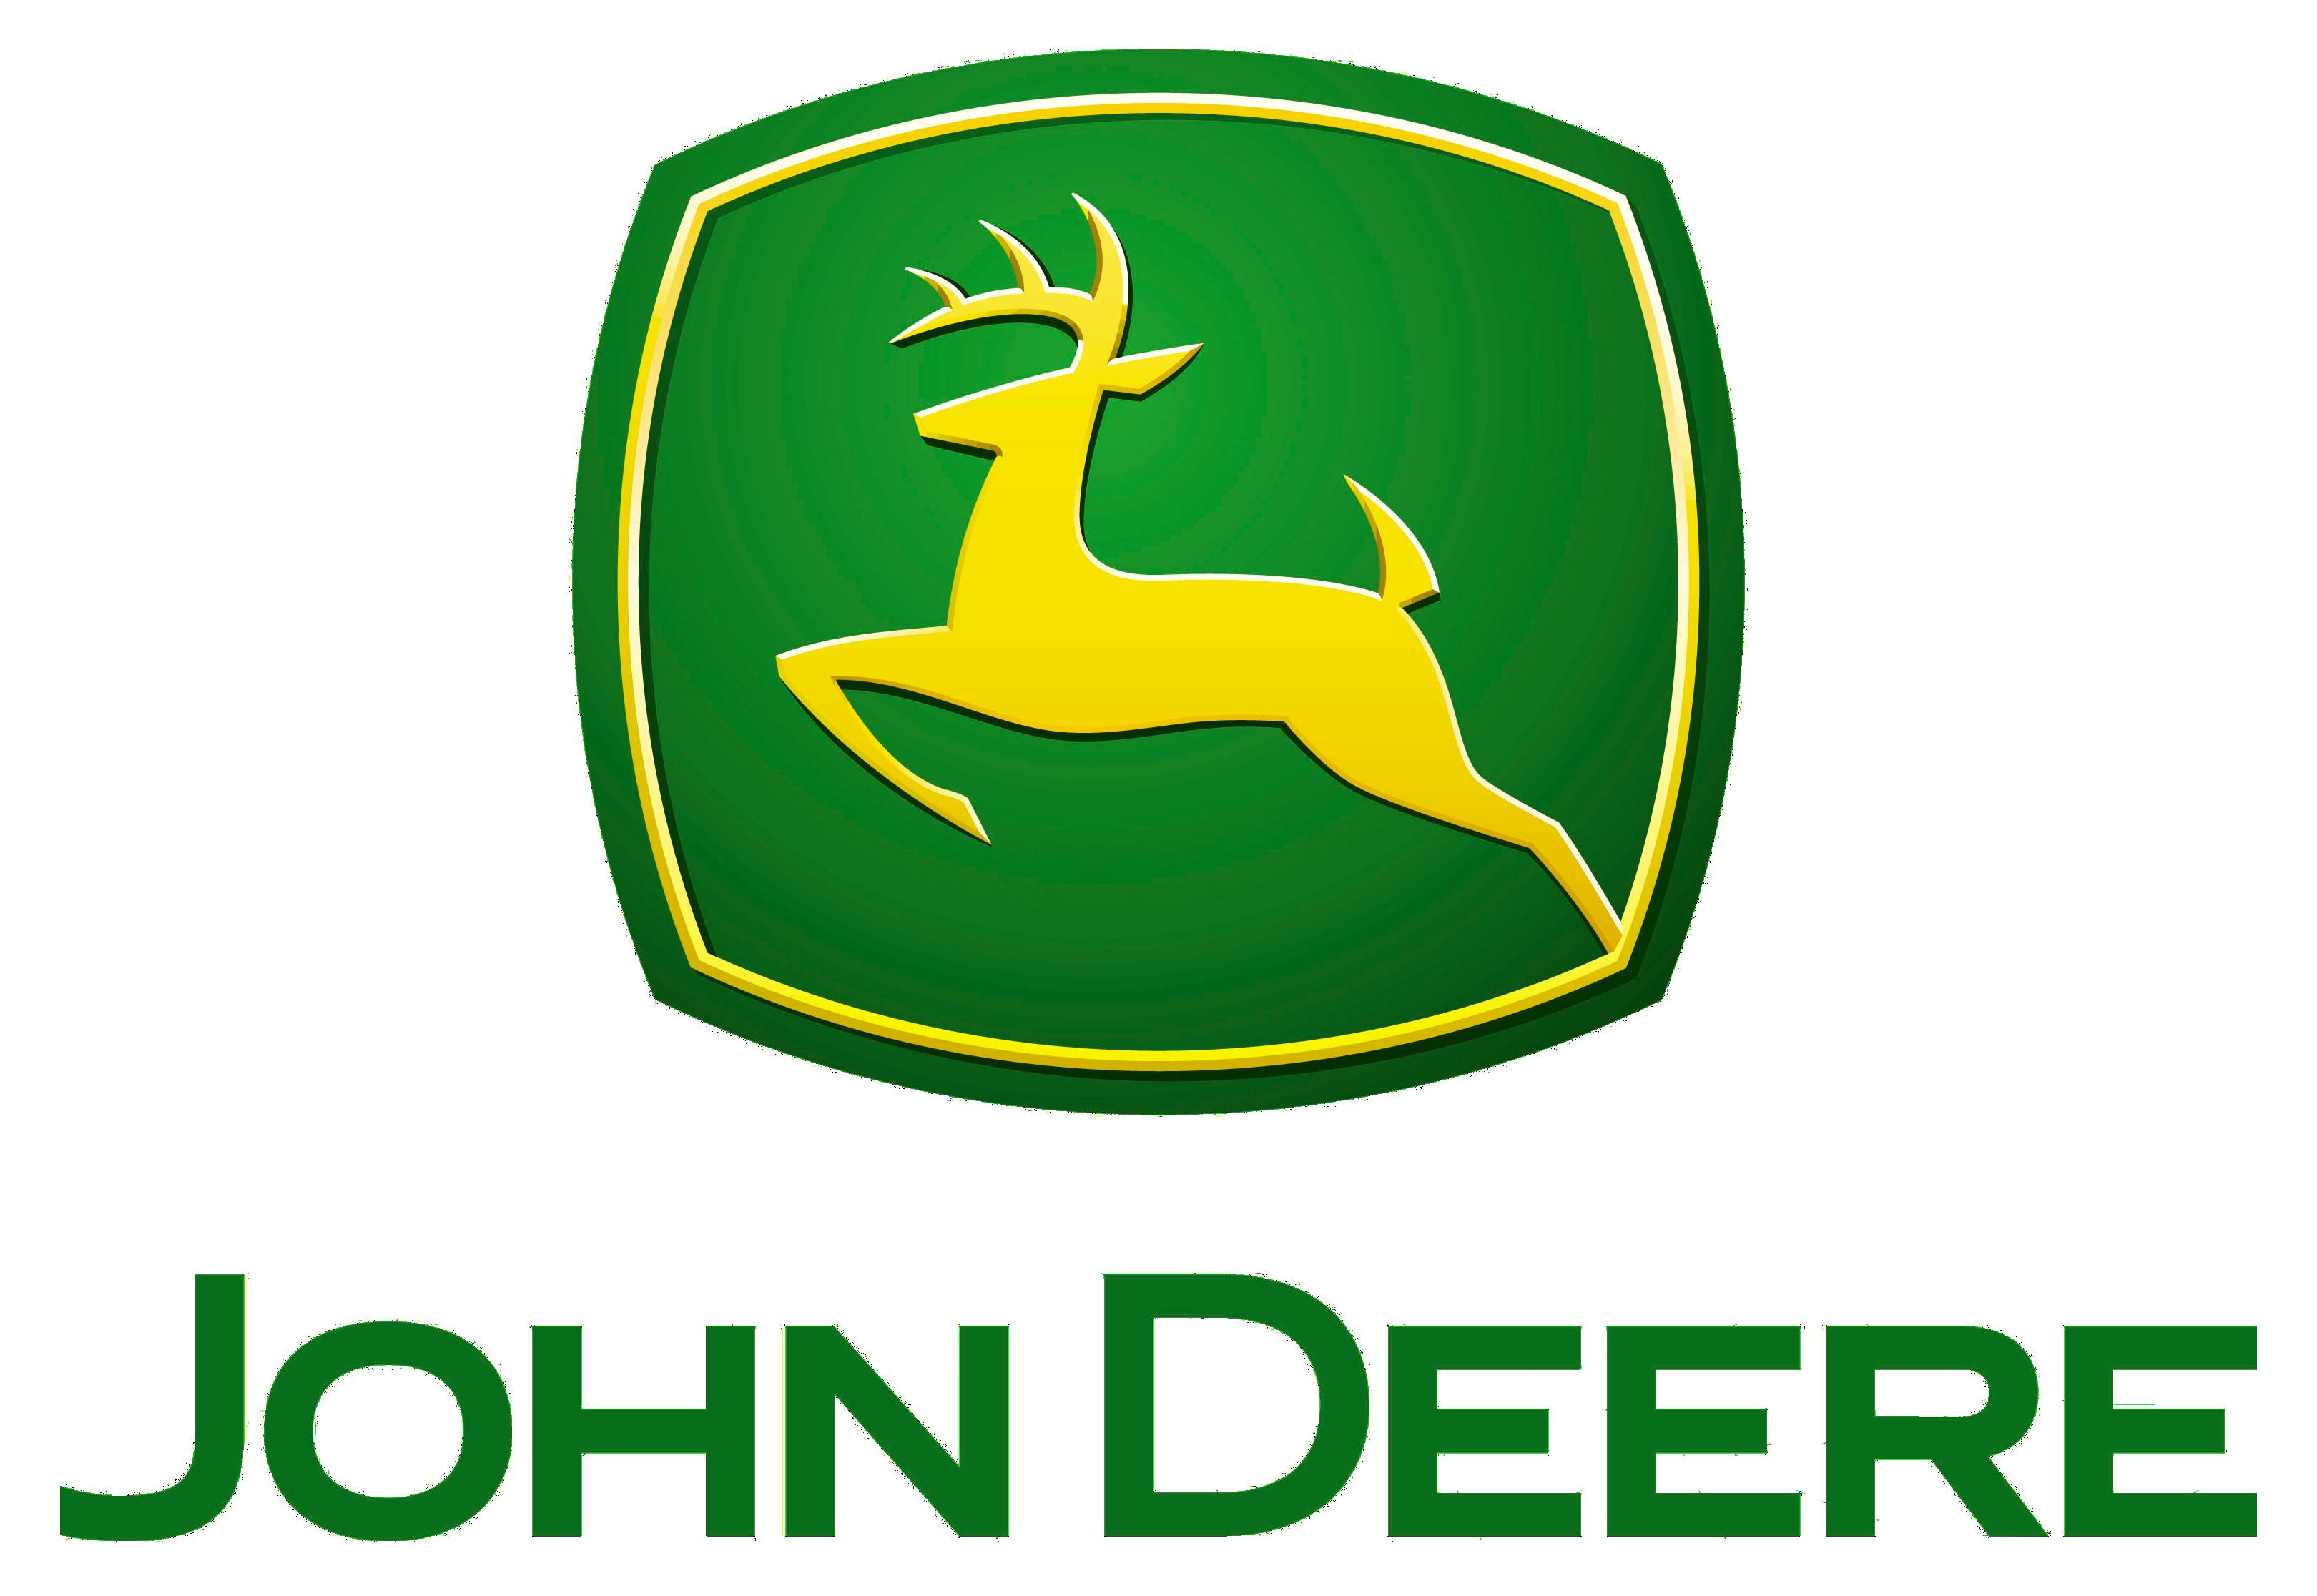 image transparent John deere clipart symbol. Pin on png images.